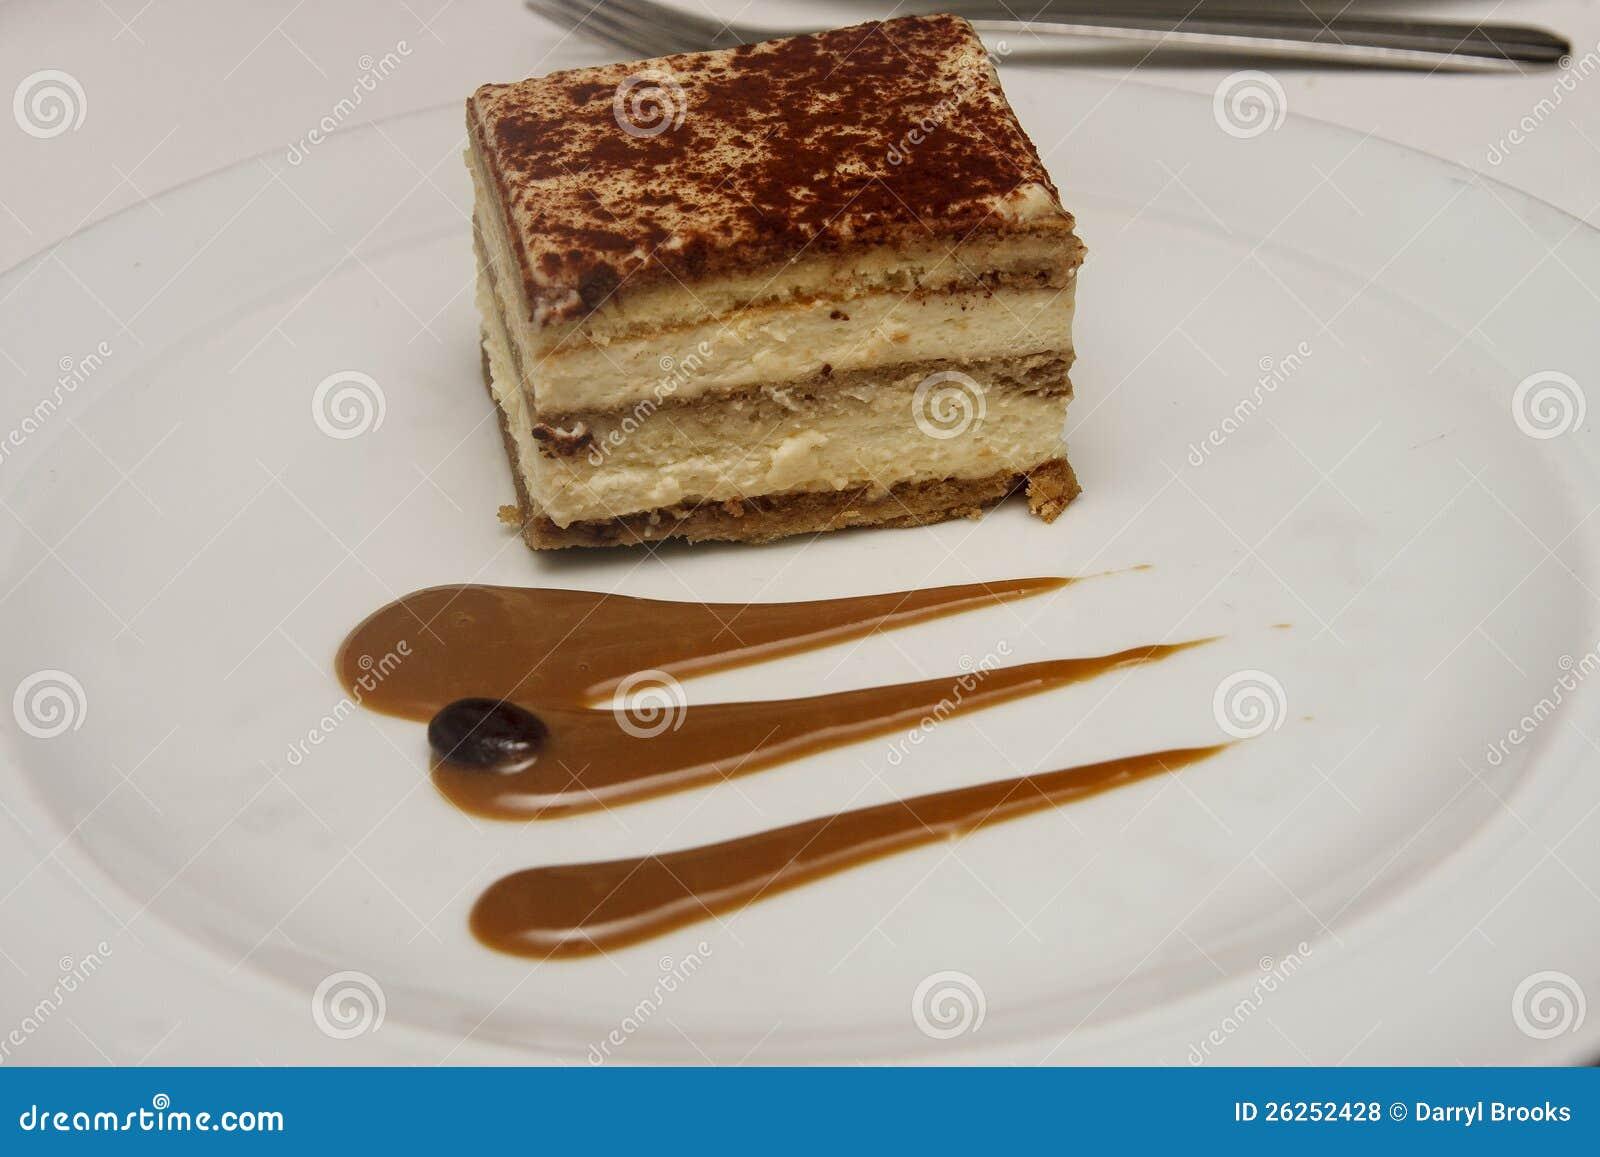 Mocha Custard Dessert Royalty Free Stock Photos - Image: 26252428